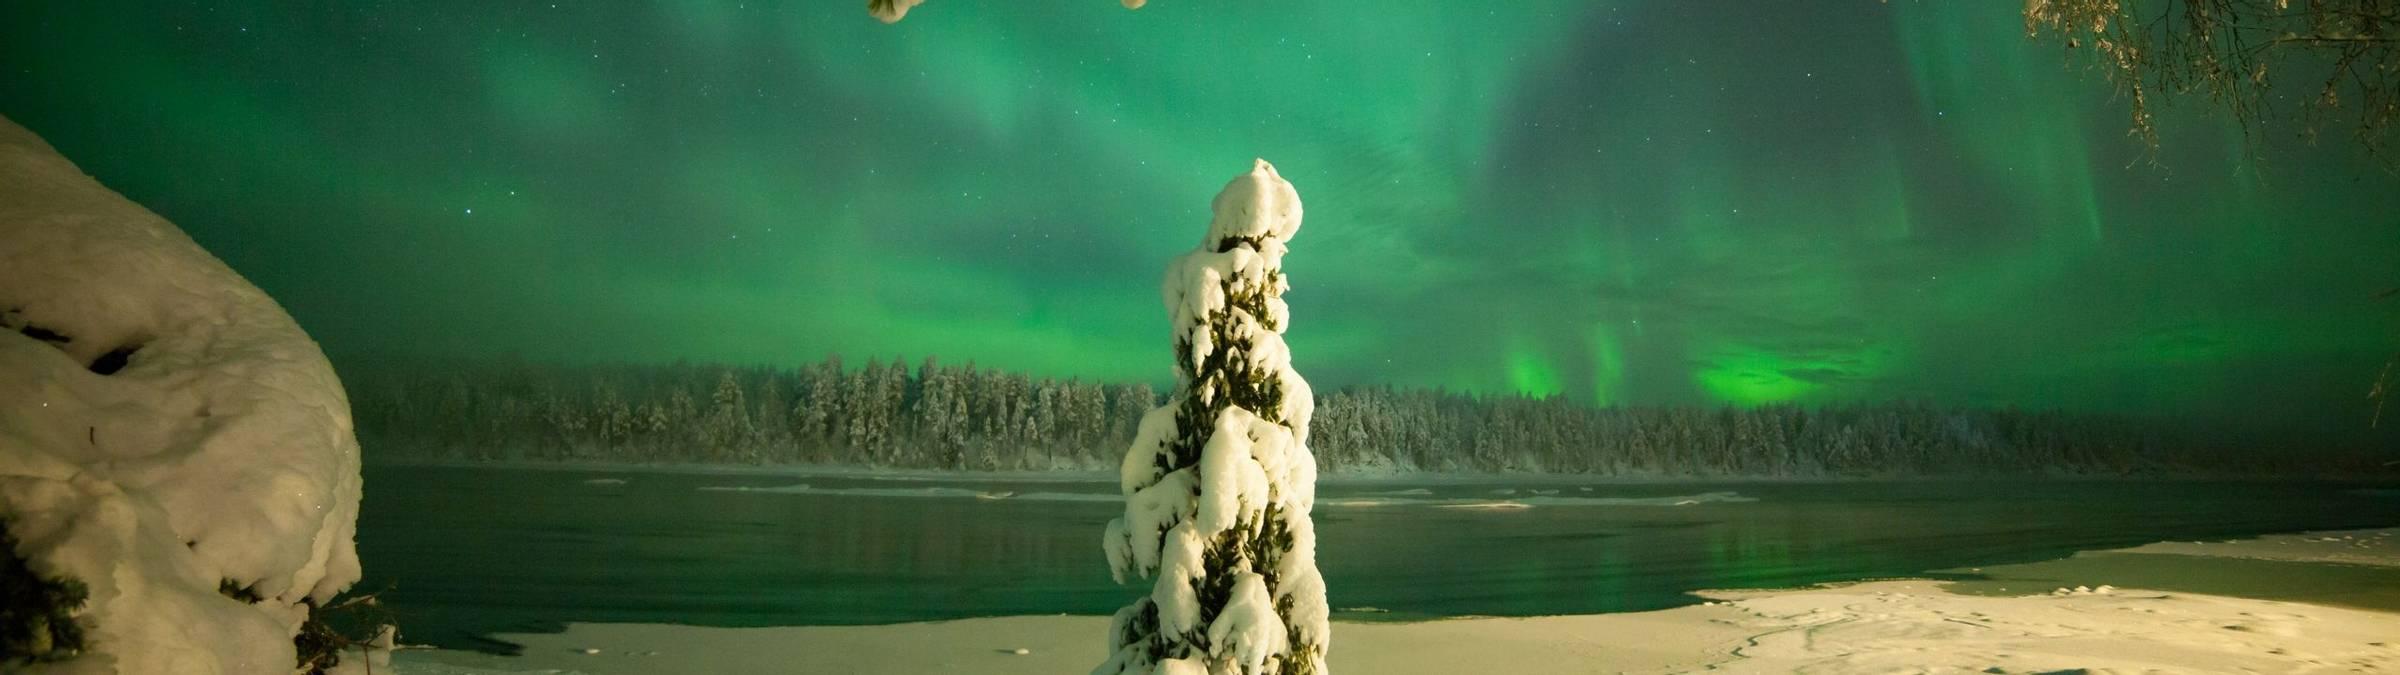 Credit - Antti Pietikainen (248).jpg